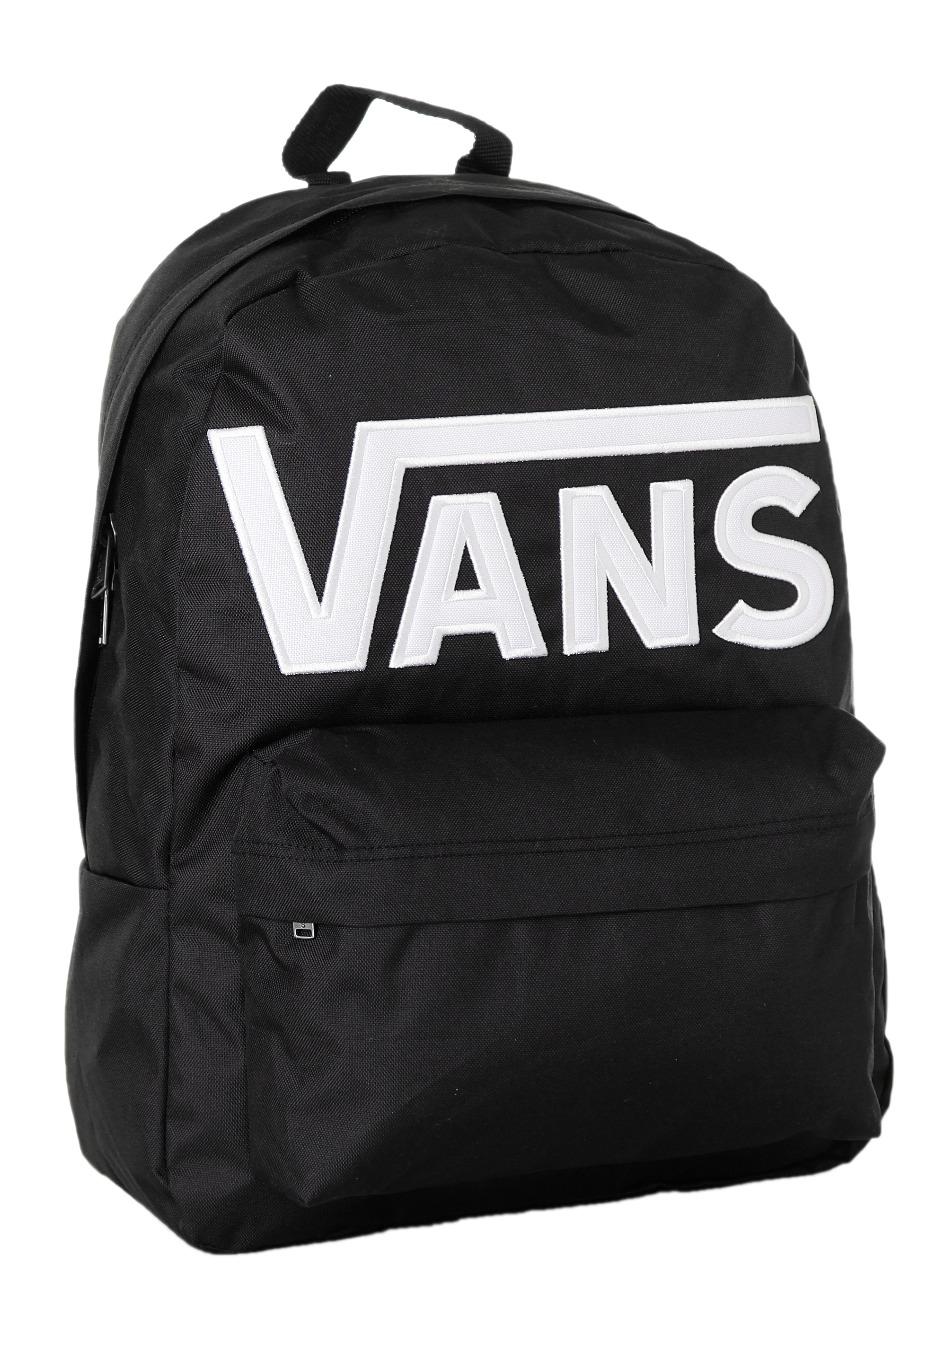 Vans - Old Skool II Black White - Backpack - Impericon.com UK fc3a1c1ad